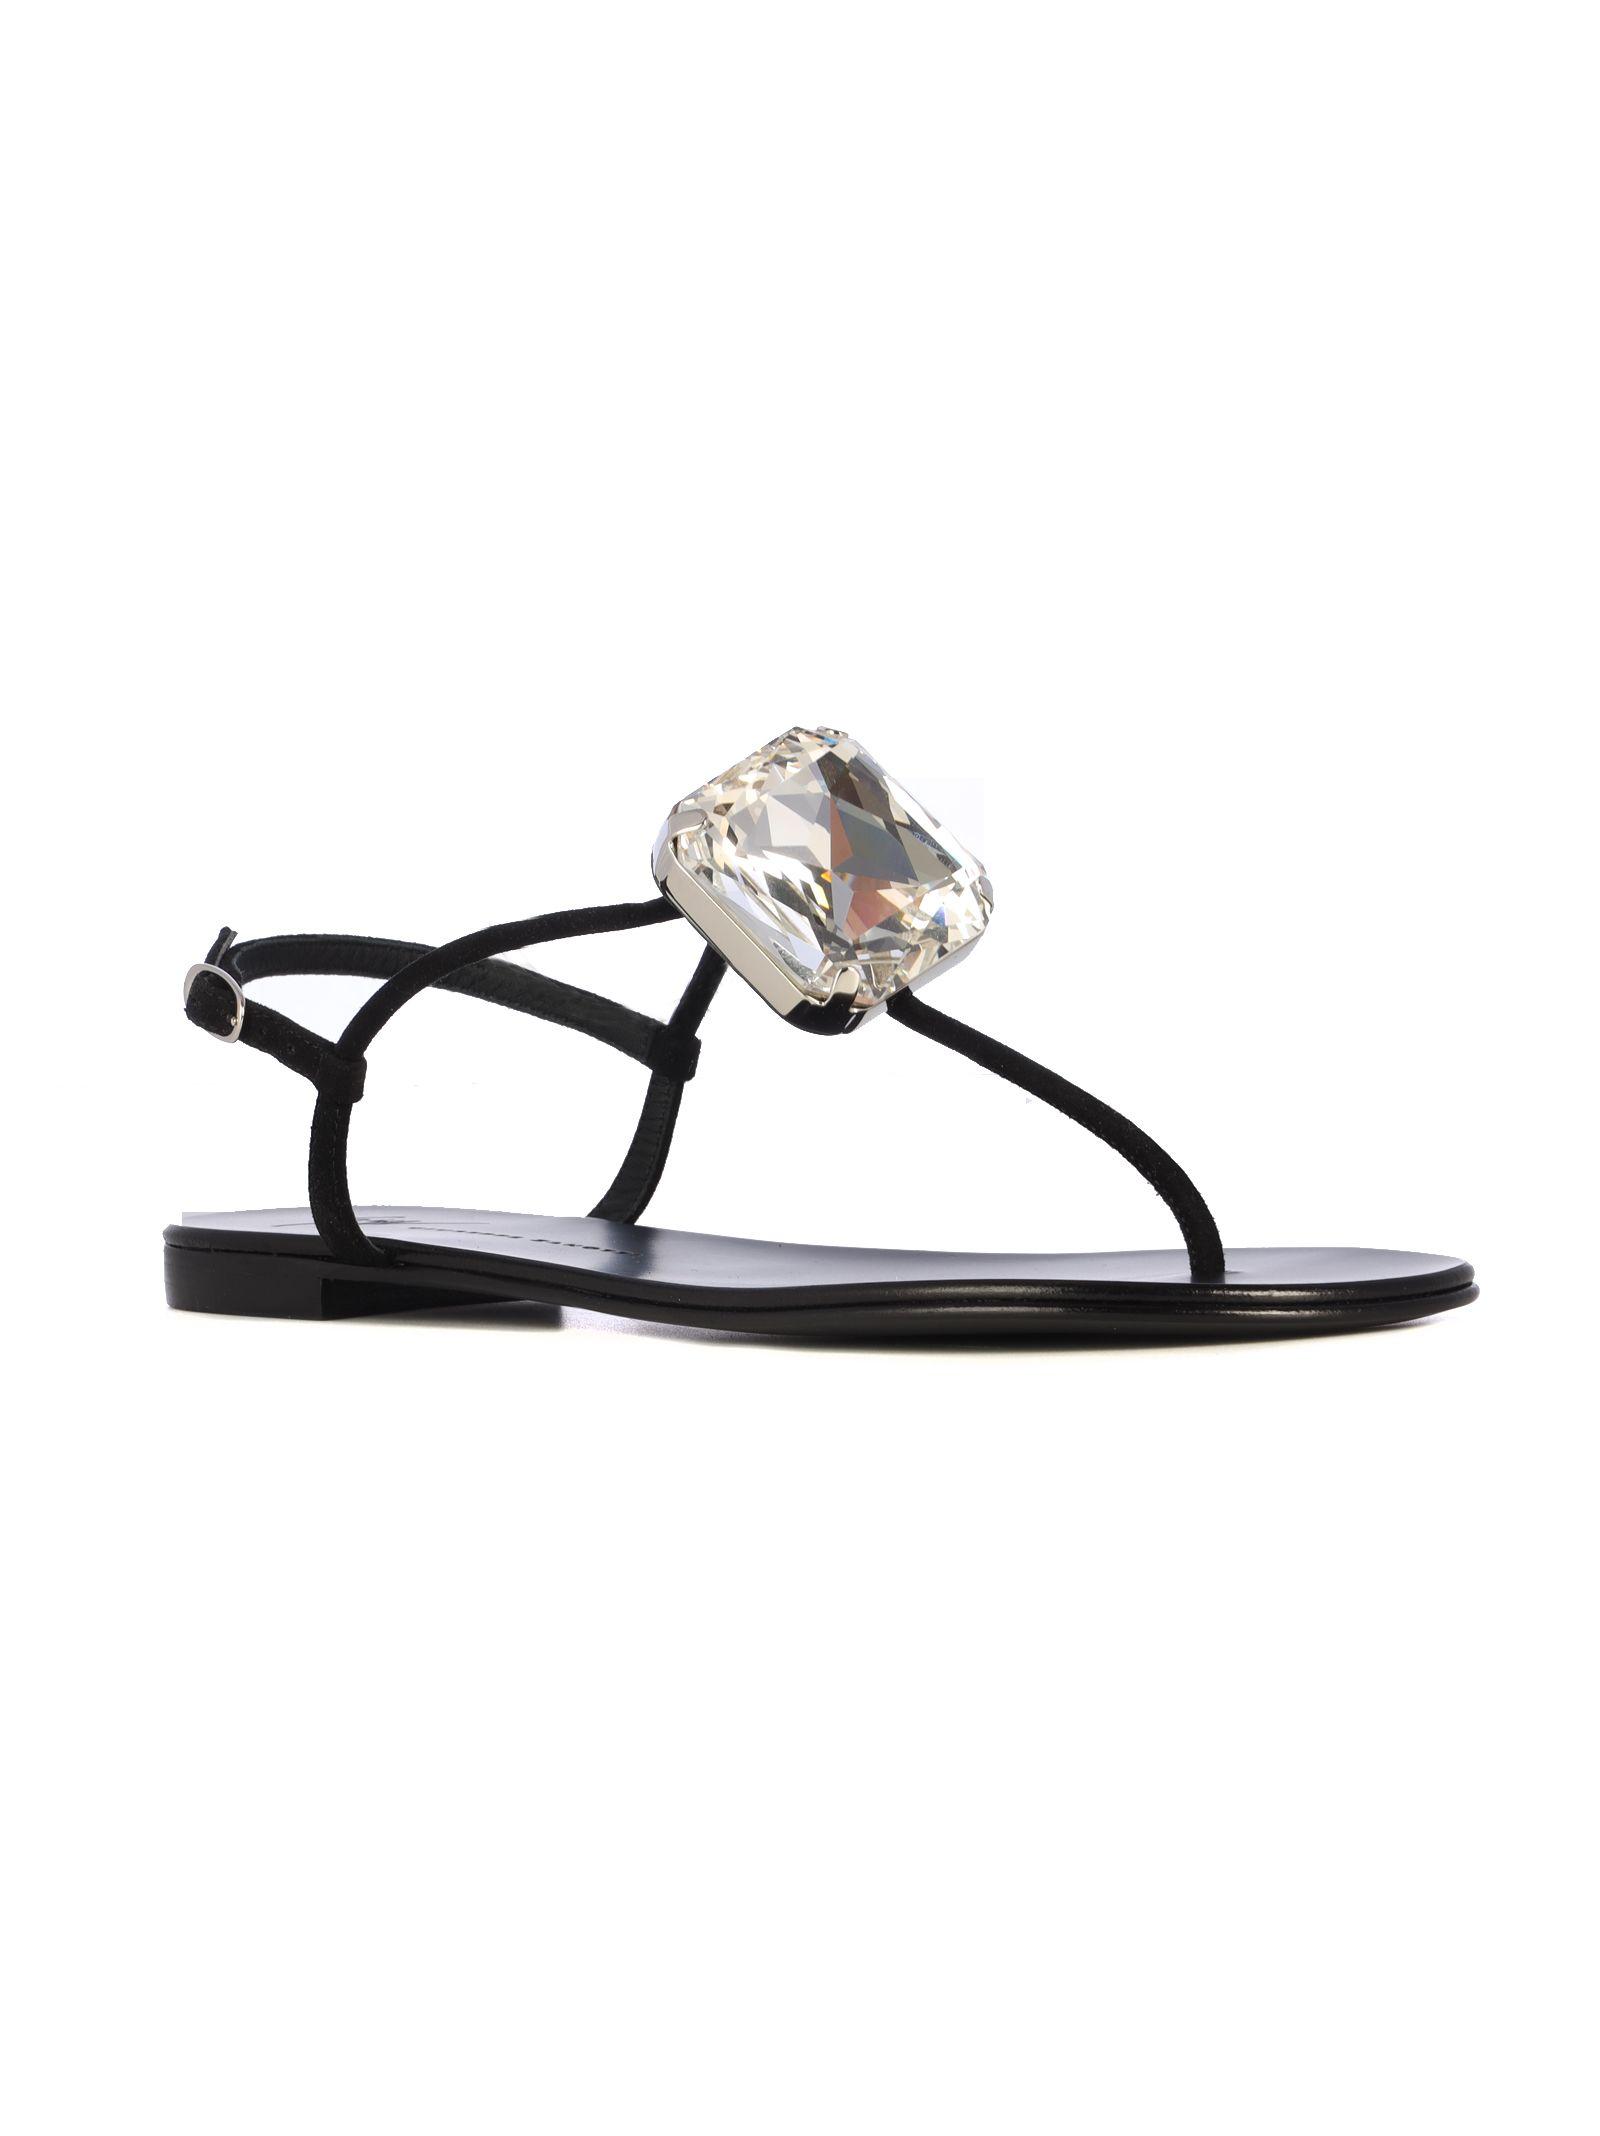 Giuseppe Zanotti Sandals Giuseppe Zanotti Crystal Embellished Sandals